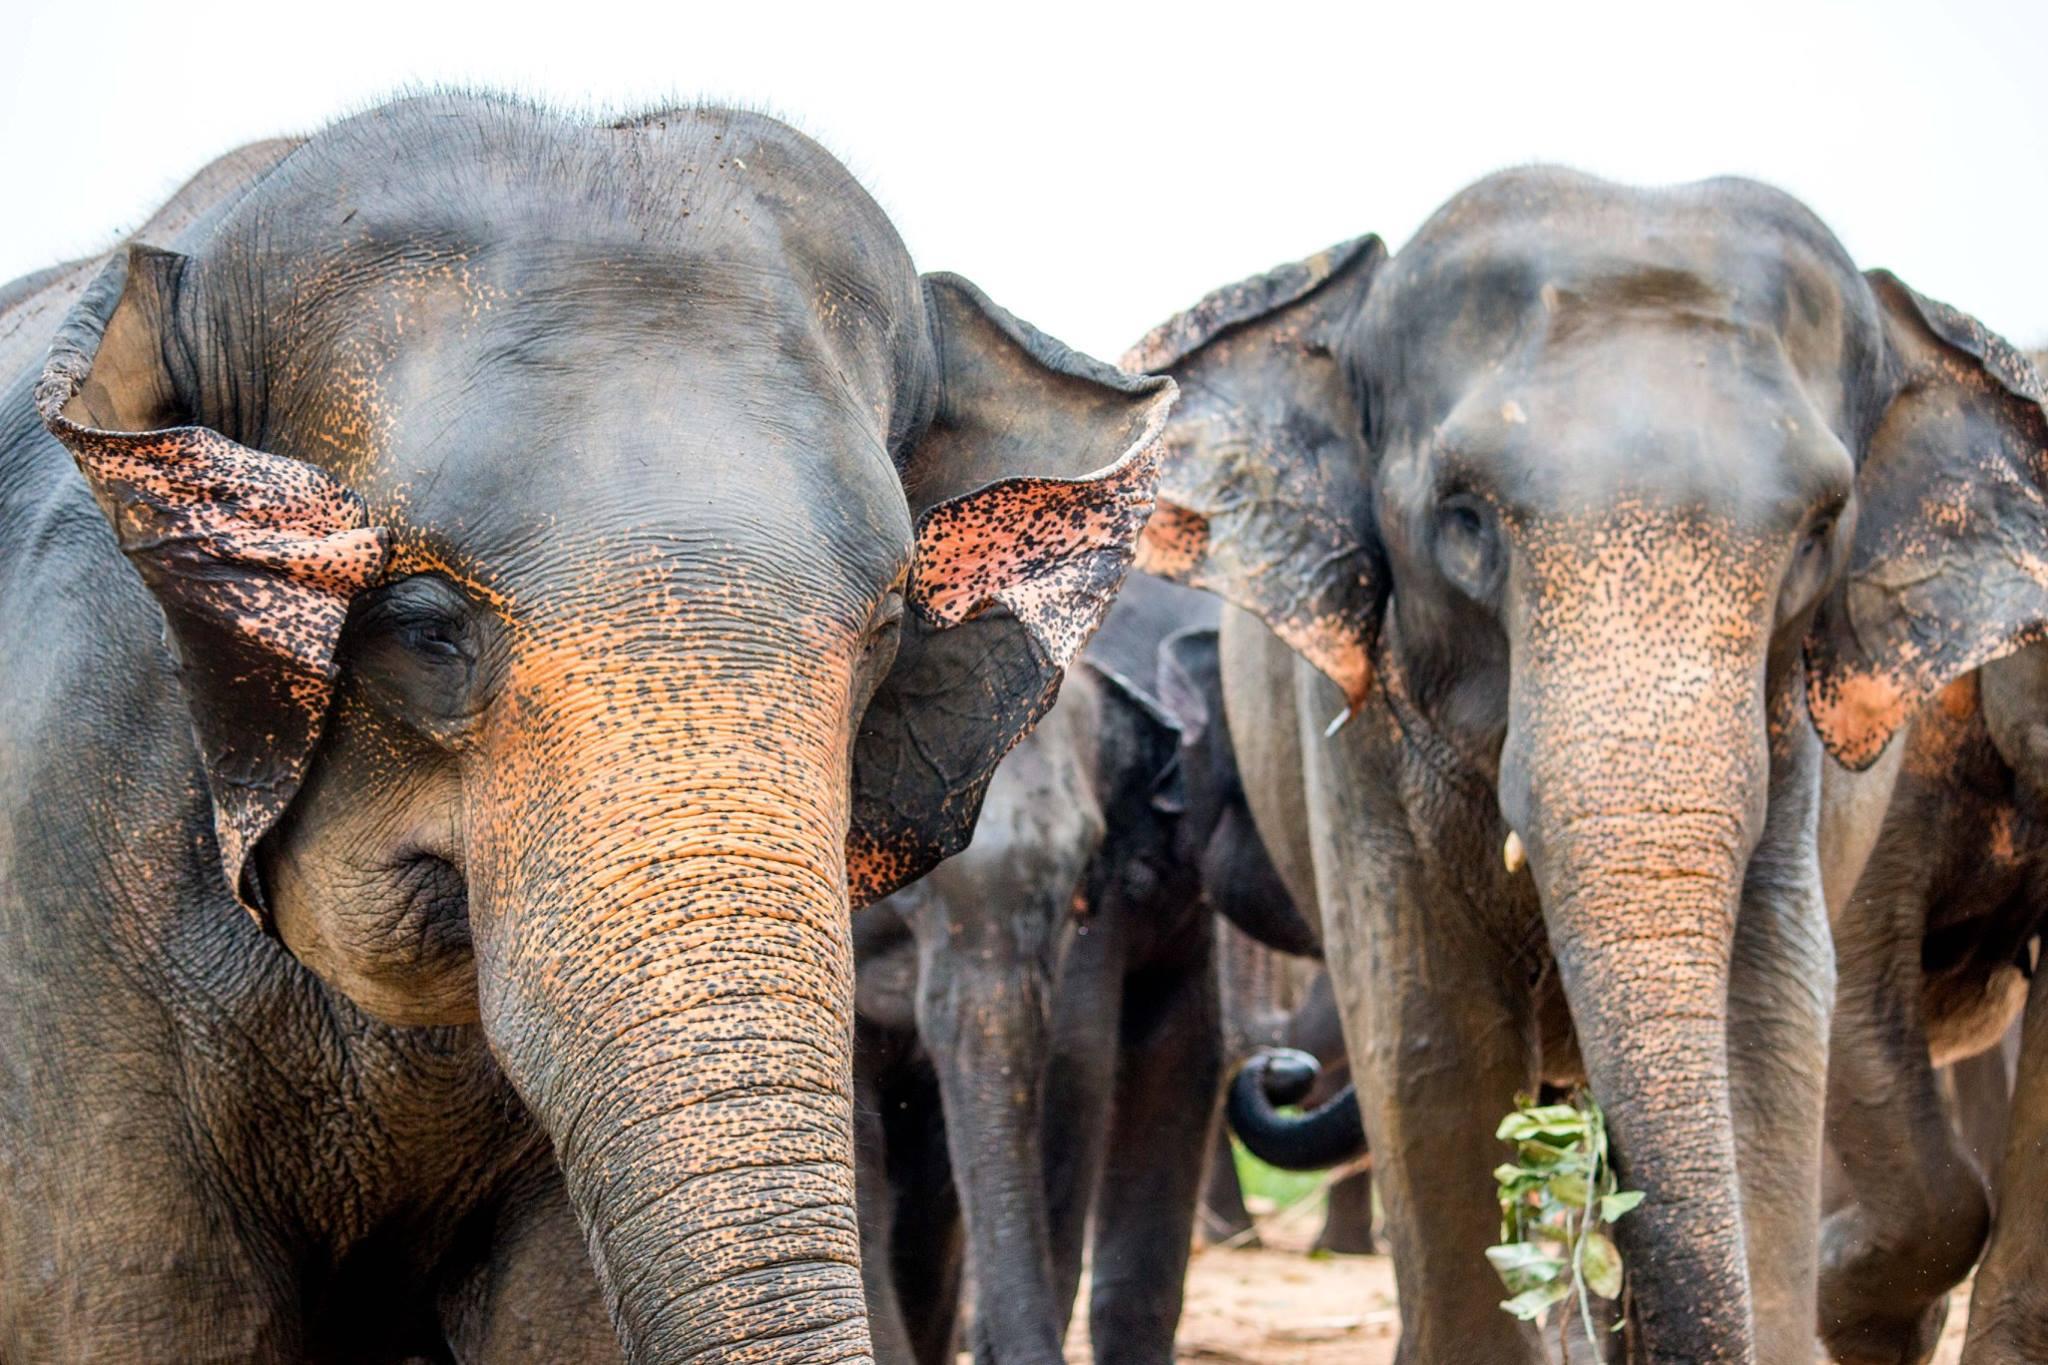 invite-to-paradise-sri-lanka-and-maldives-specialists-travel-agent-tour-operator-customer-review-feedback-joel-rhian-elephant-6.jpg